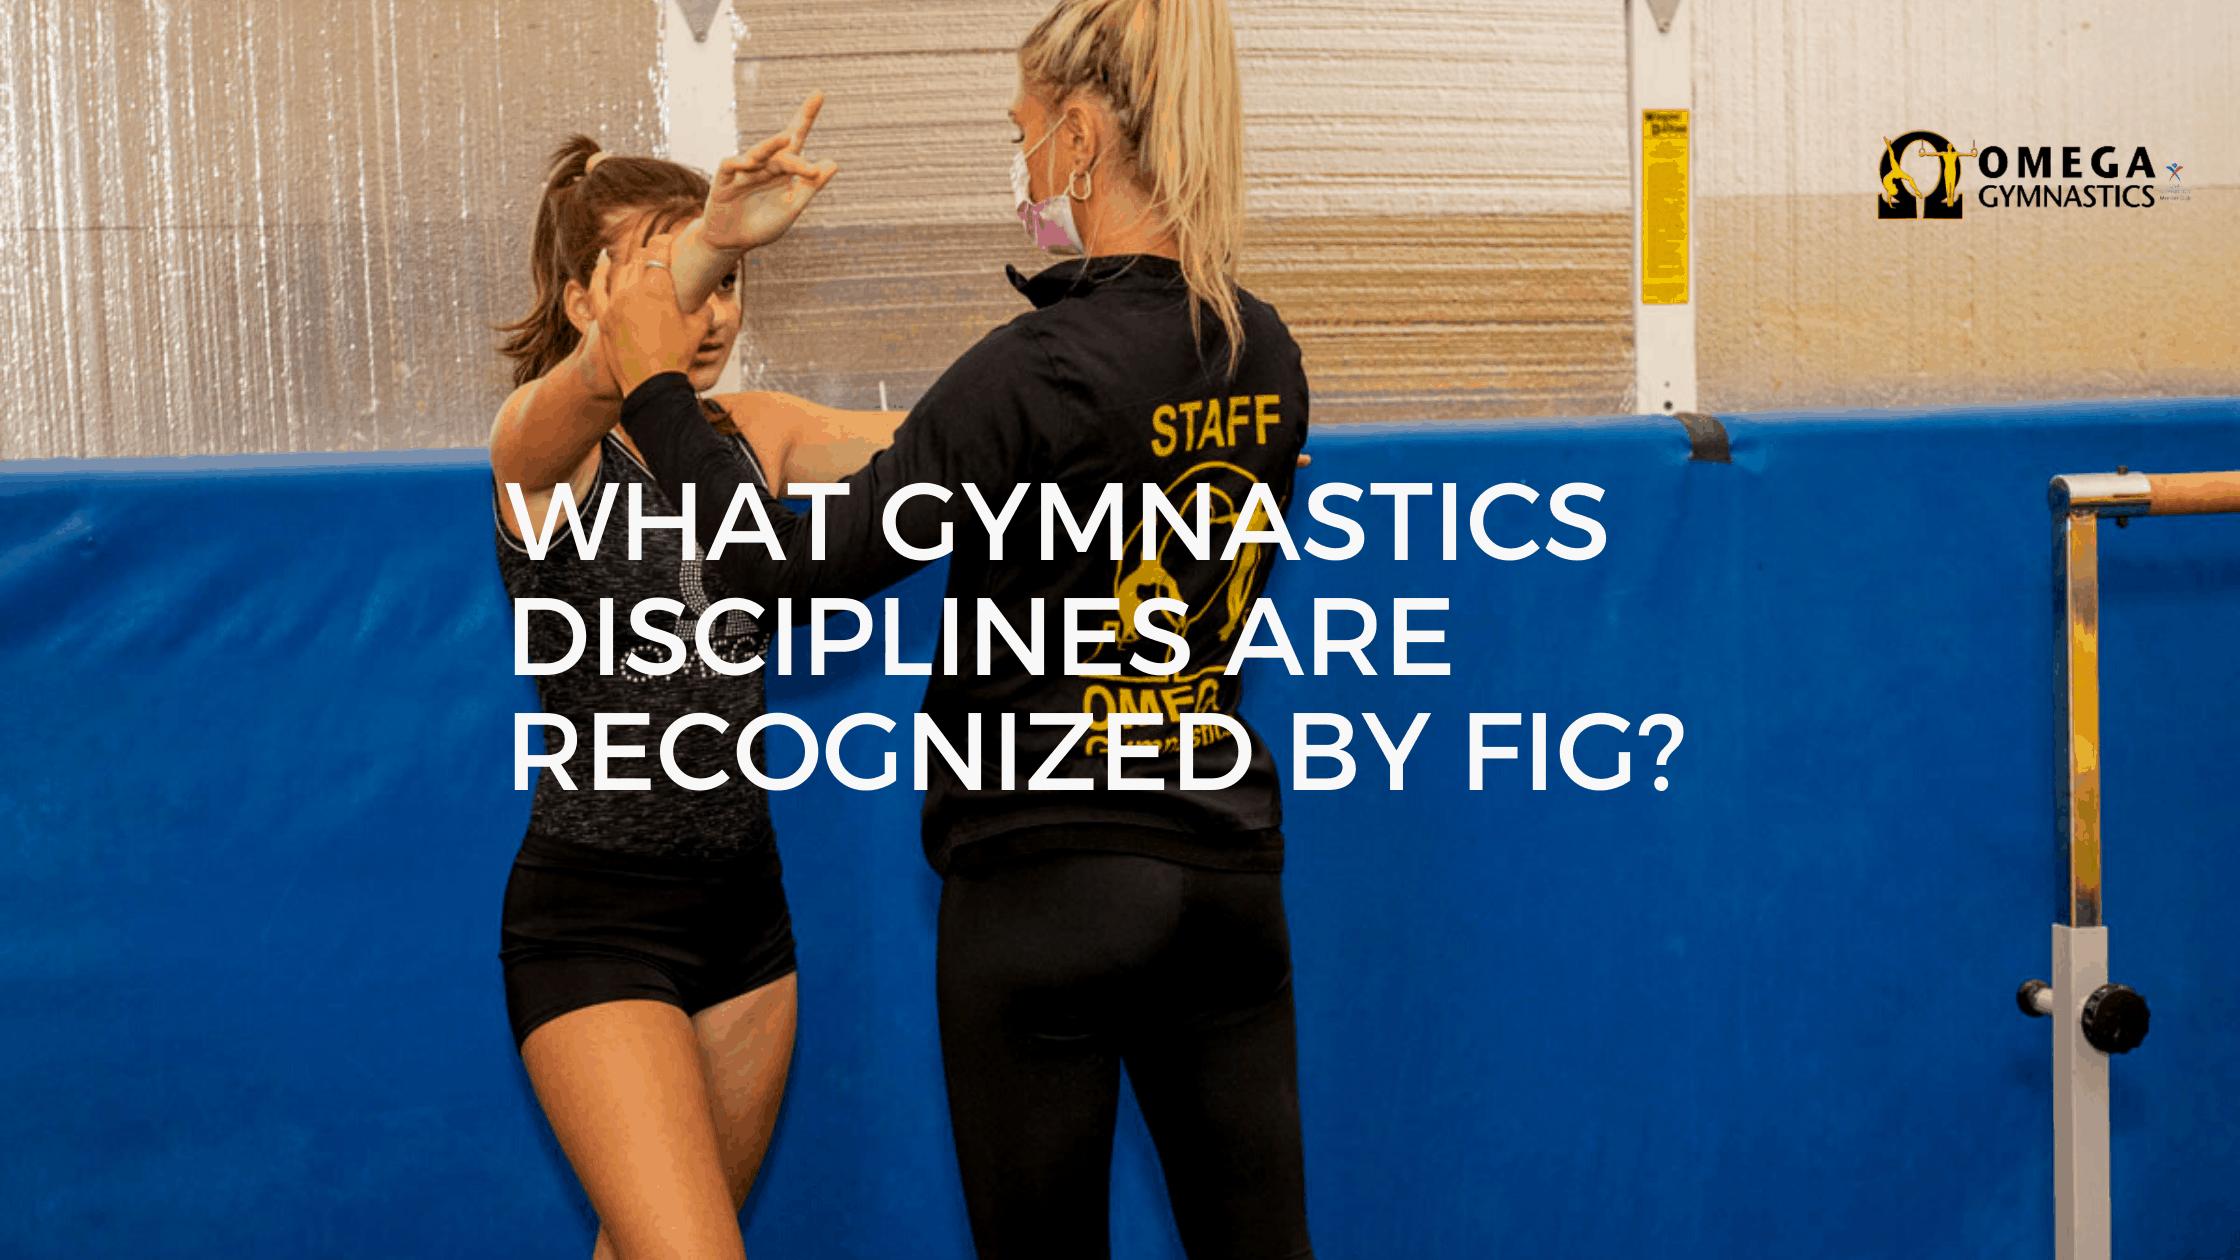 gymnastics disciplines